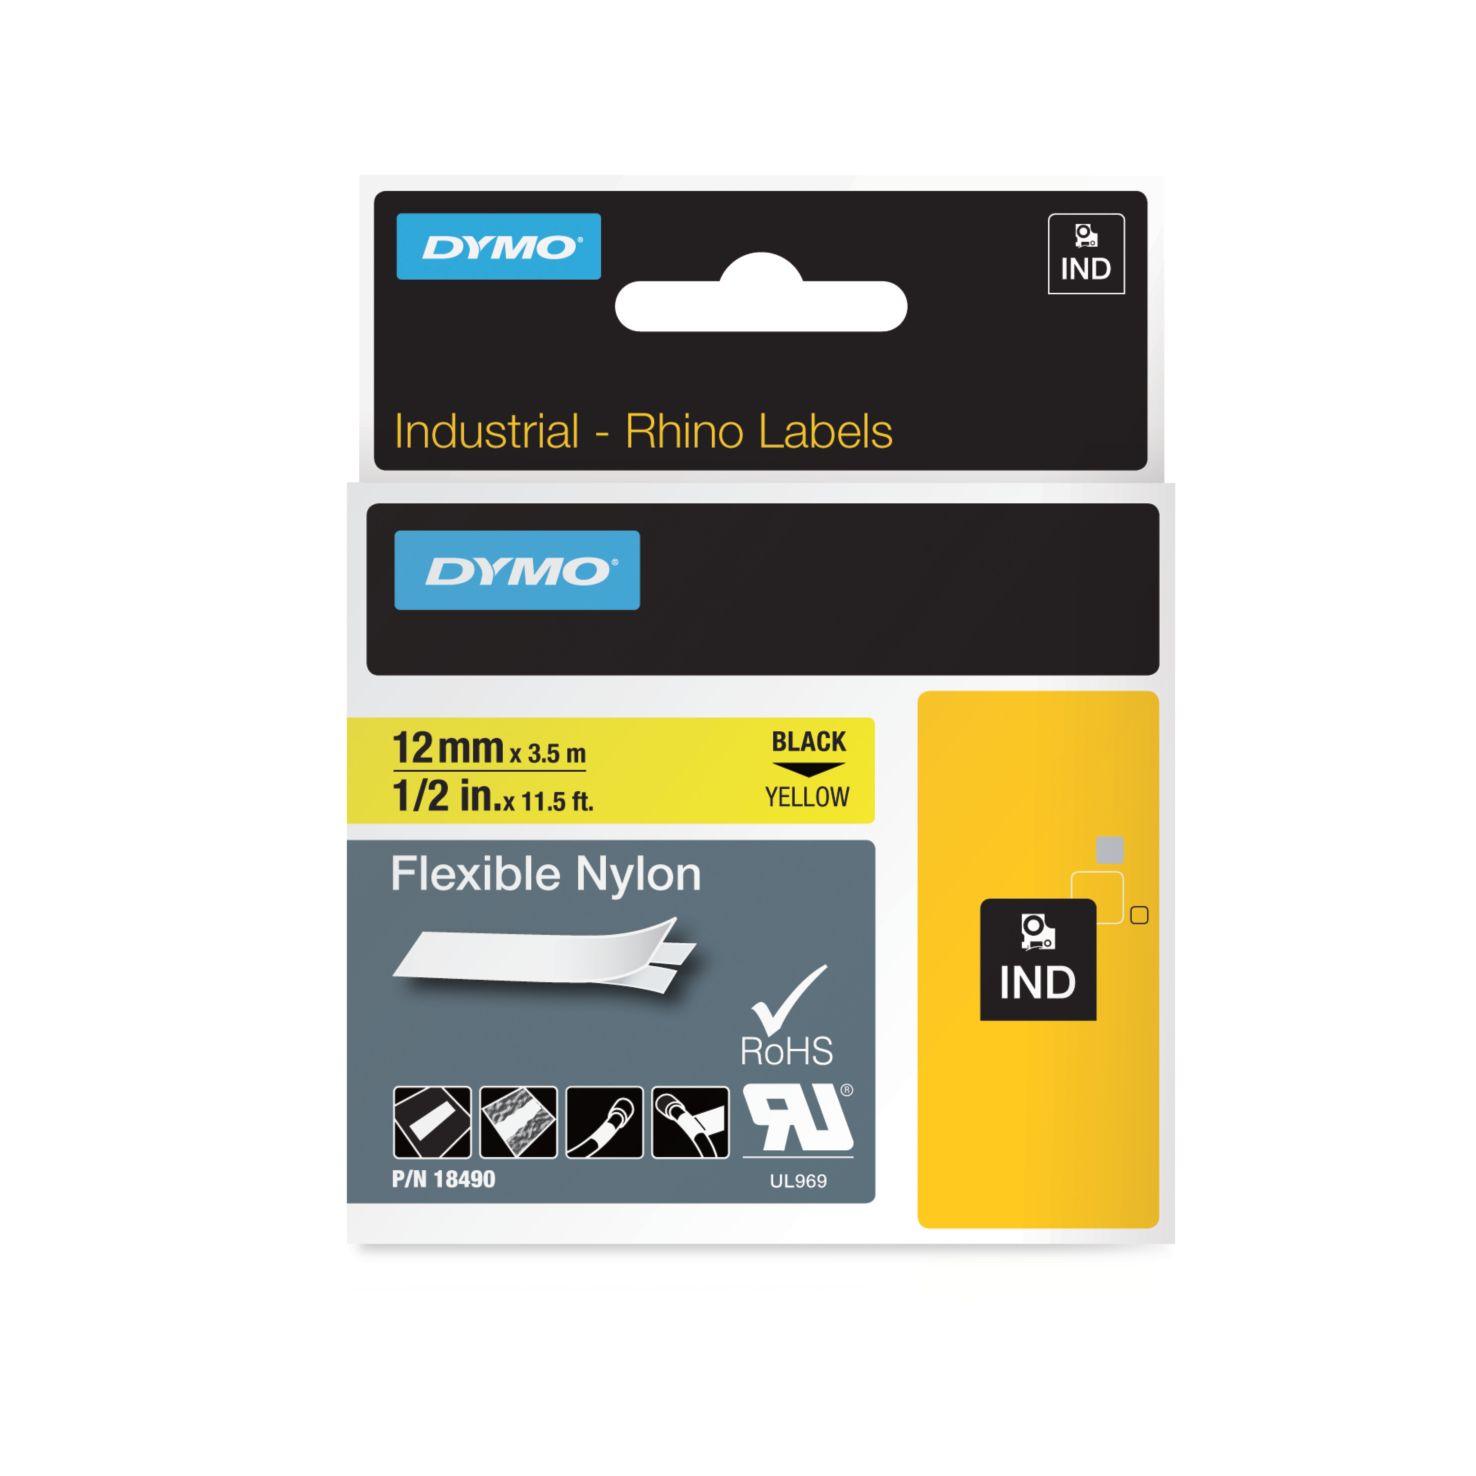 Dymo Rhino-Schriftband Nylon 12mm x 3,5m schwarz auf gelb